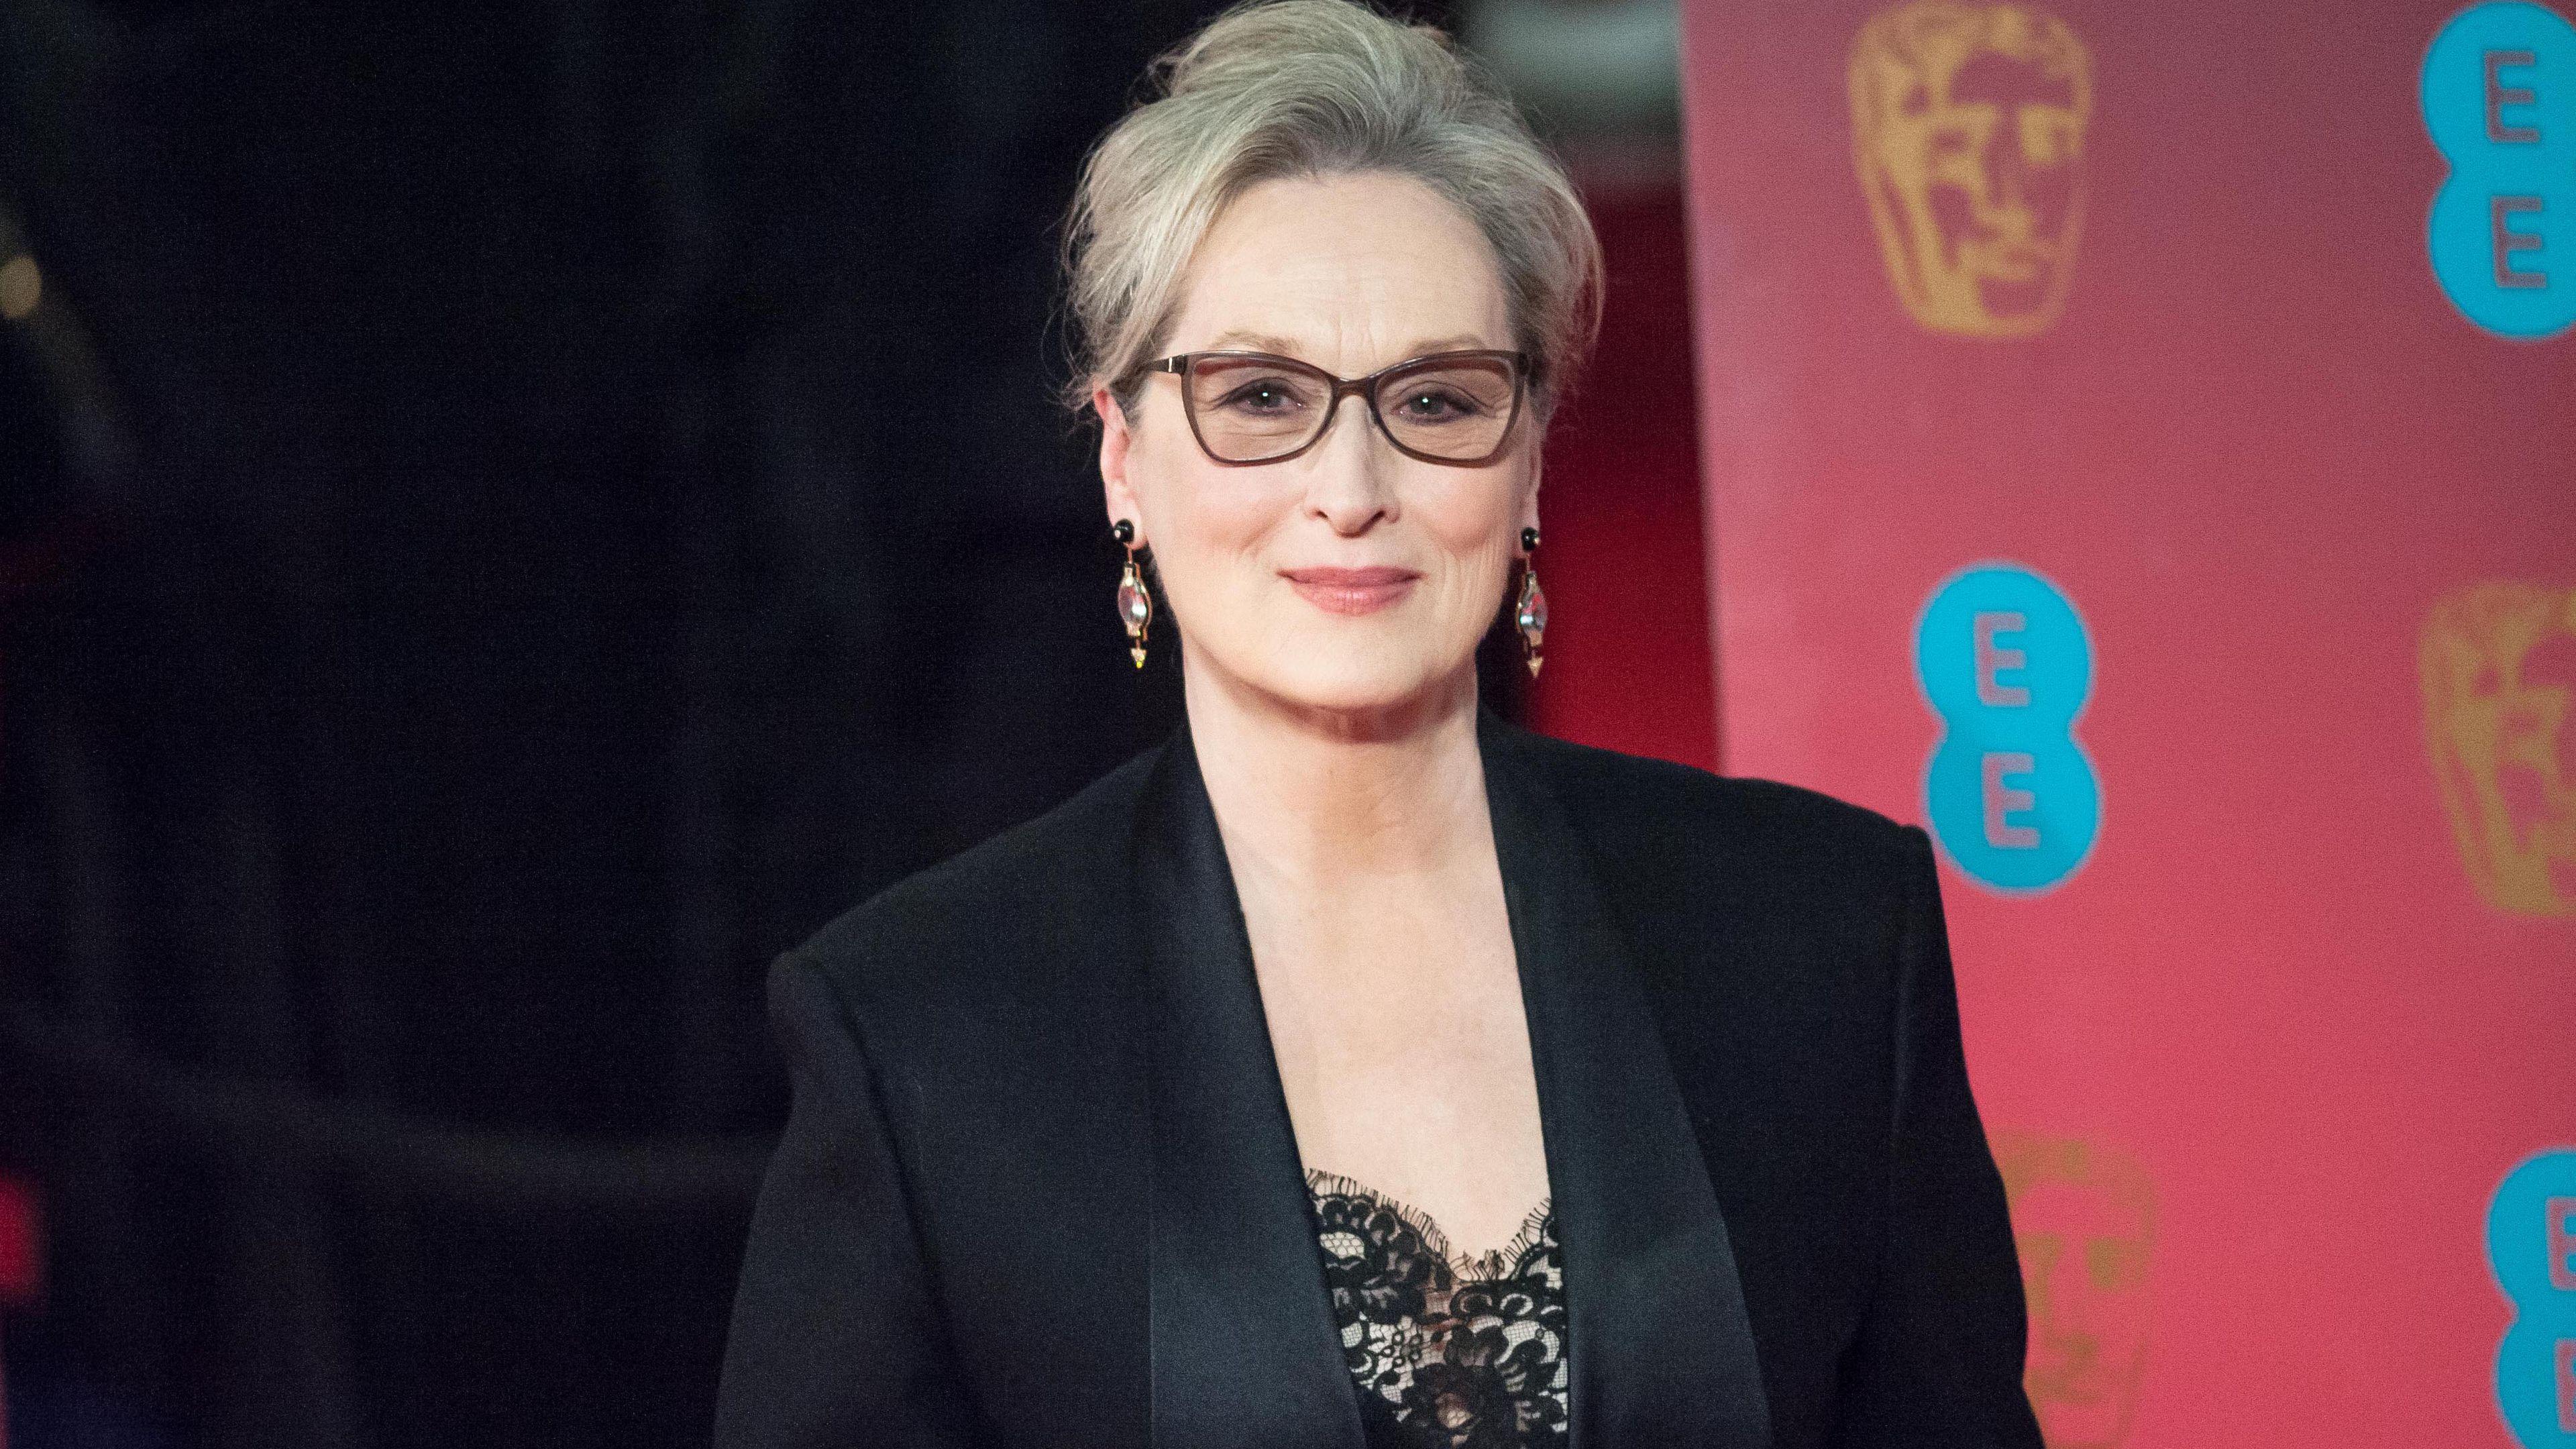 Meryl Streep defends herself against Karl Lagerfeld's claims